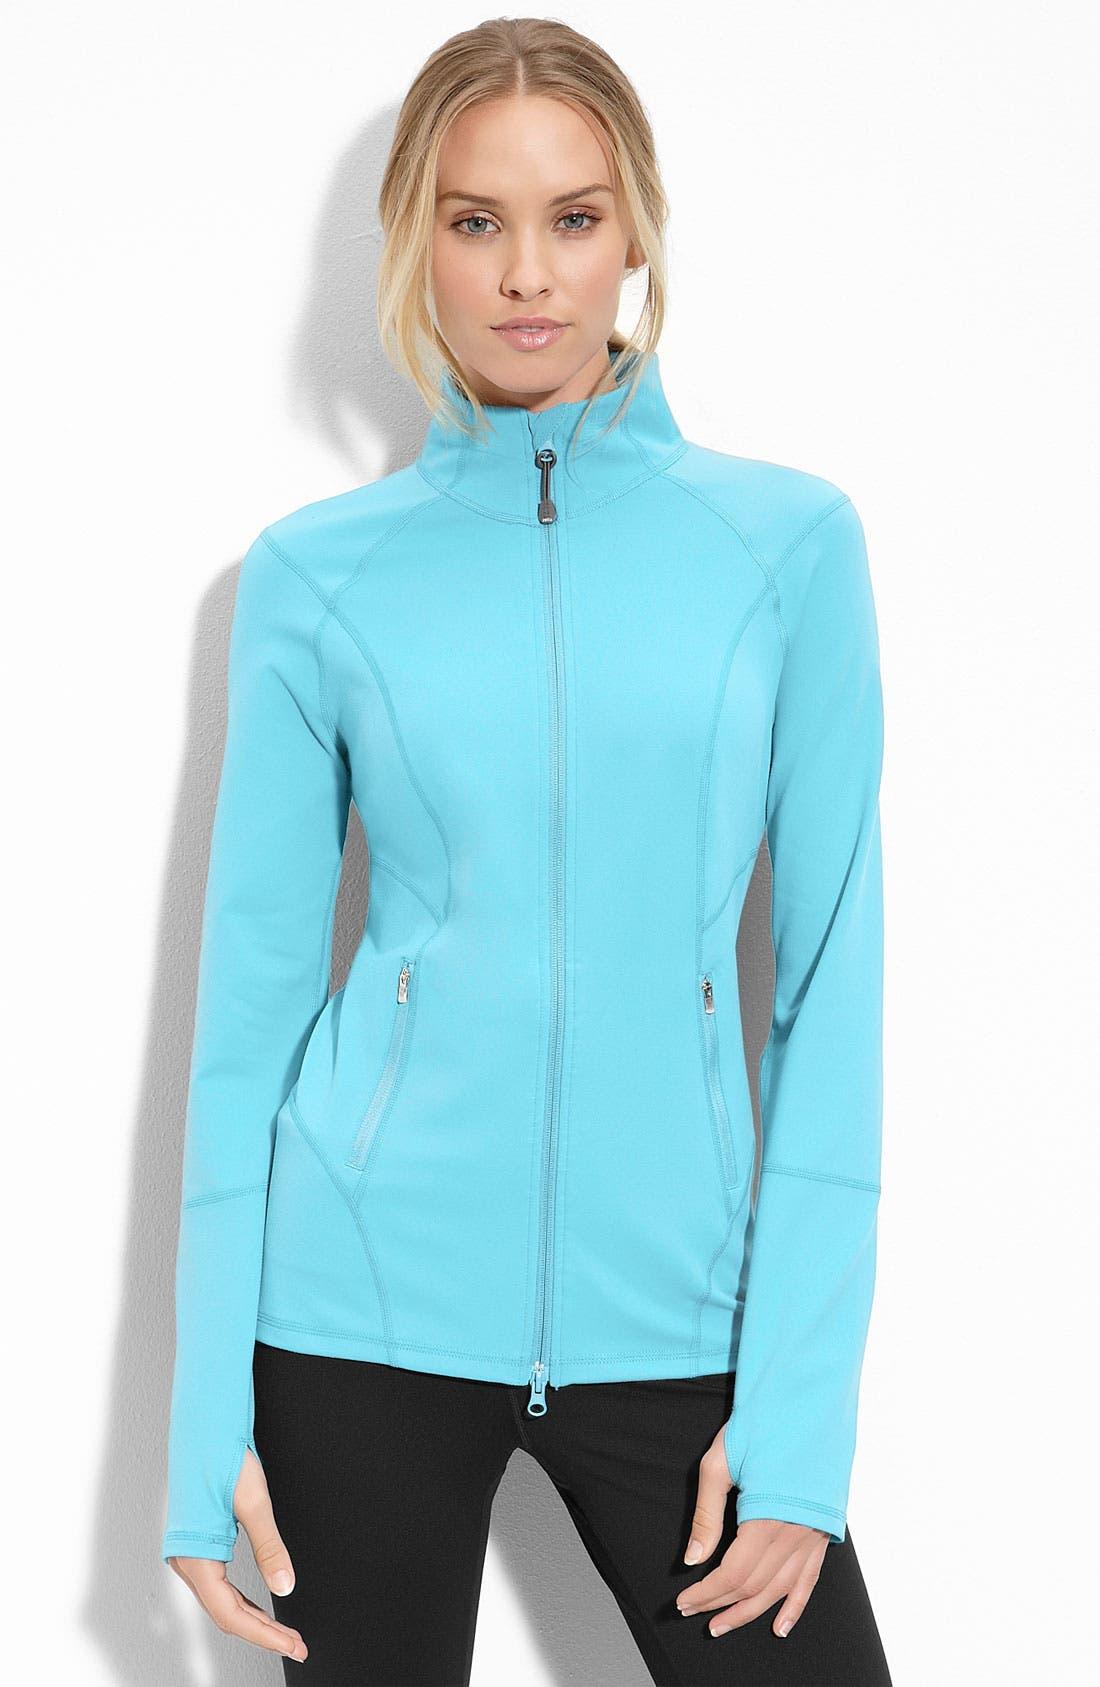 Main Image - Zella 'New Intersect' Jacket